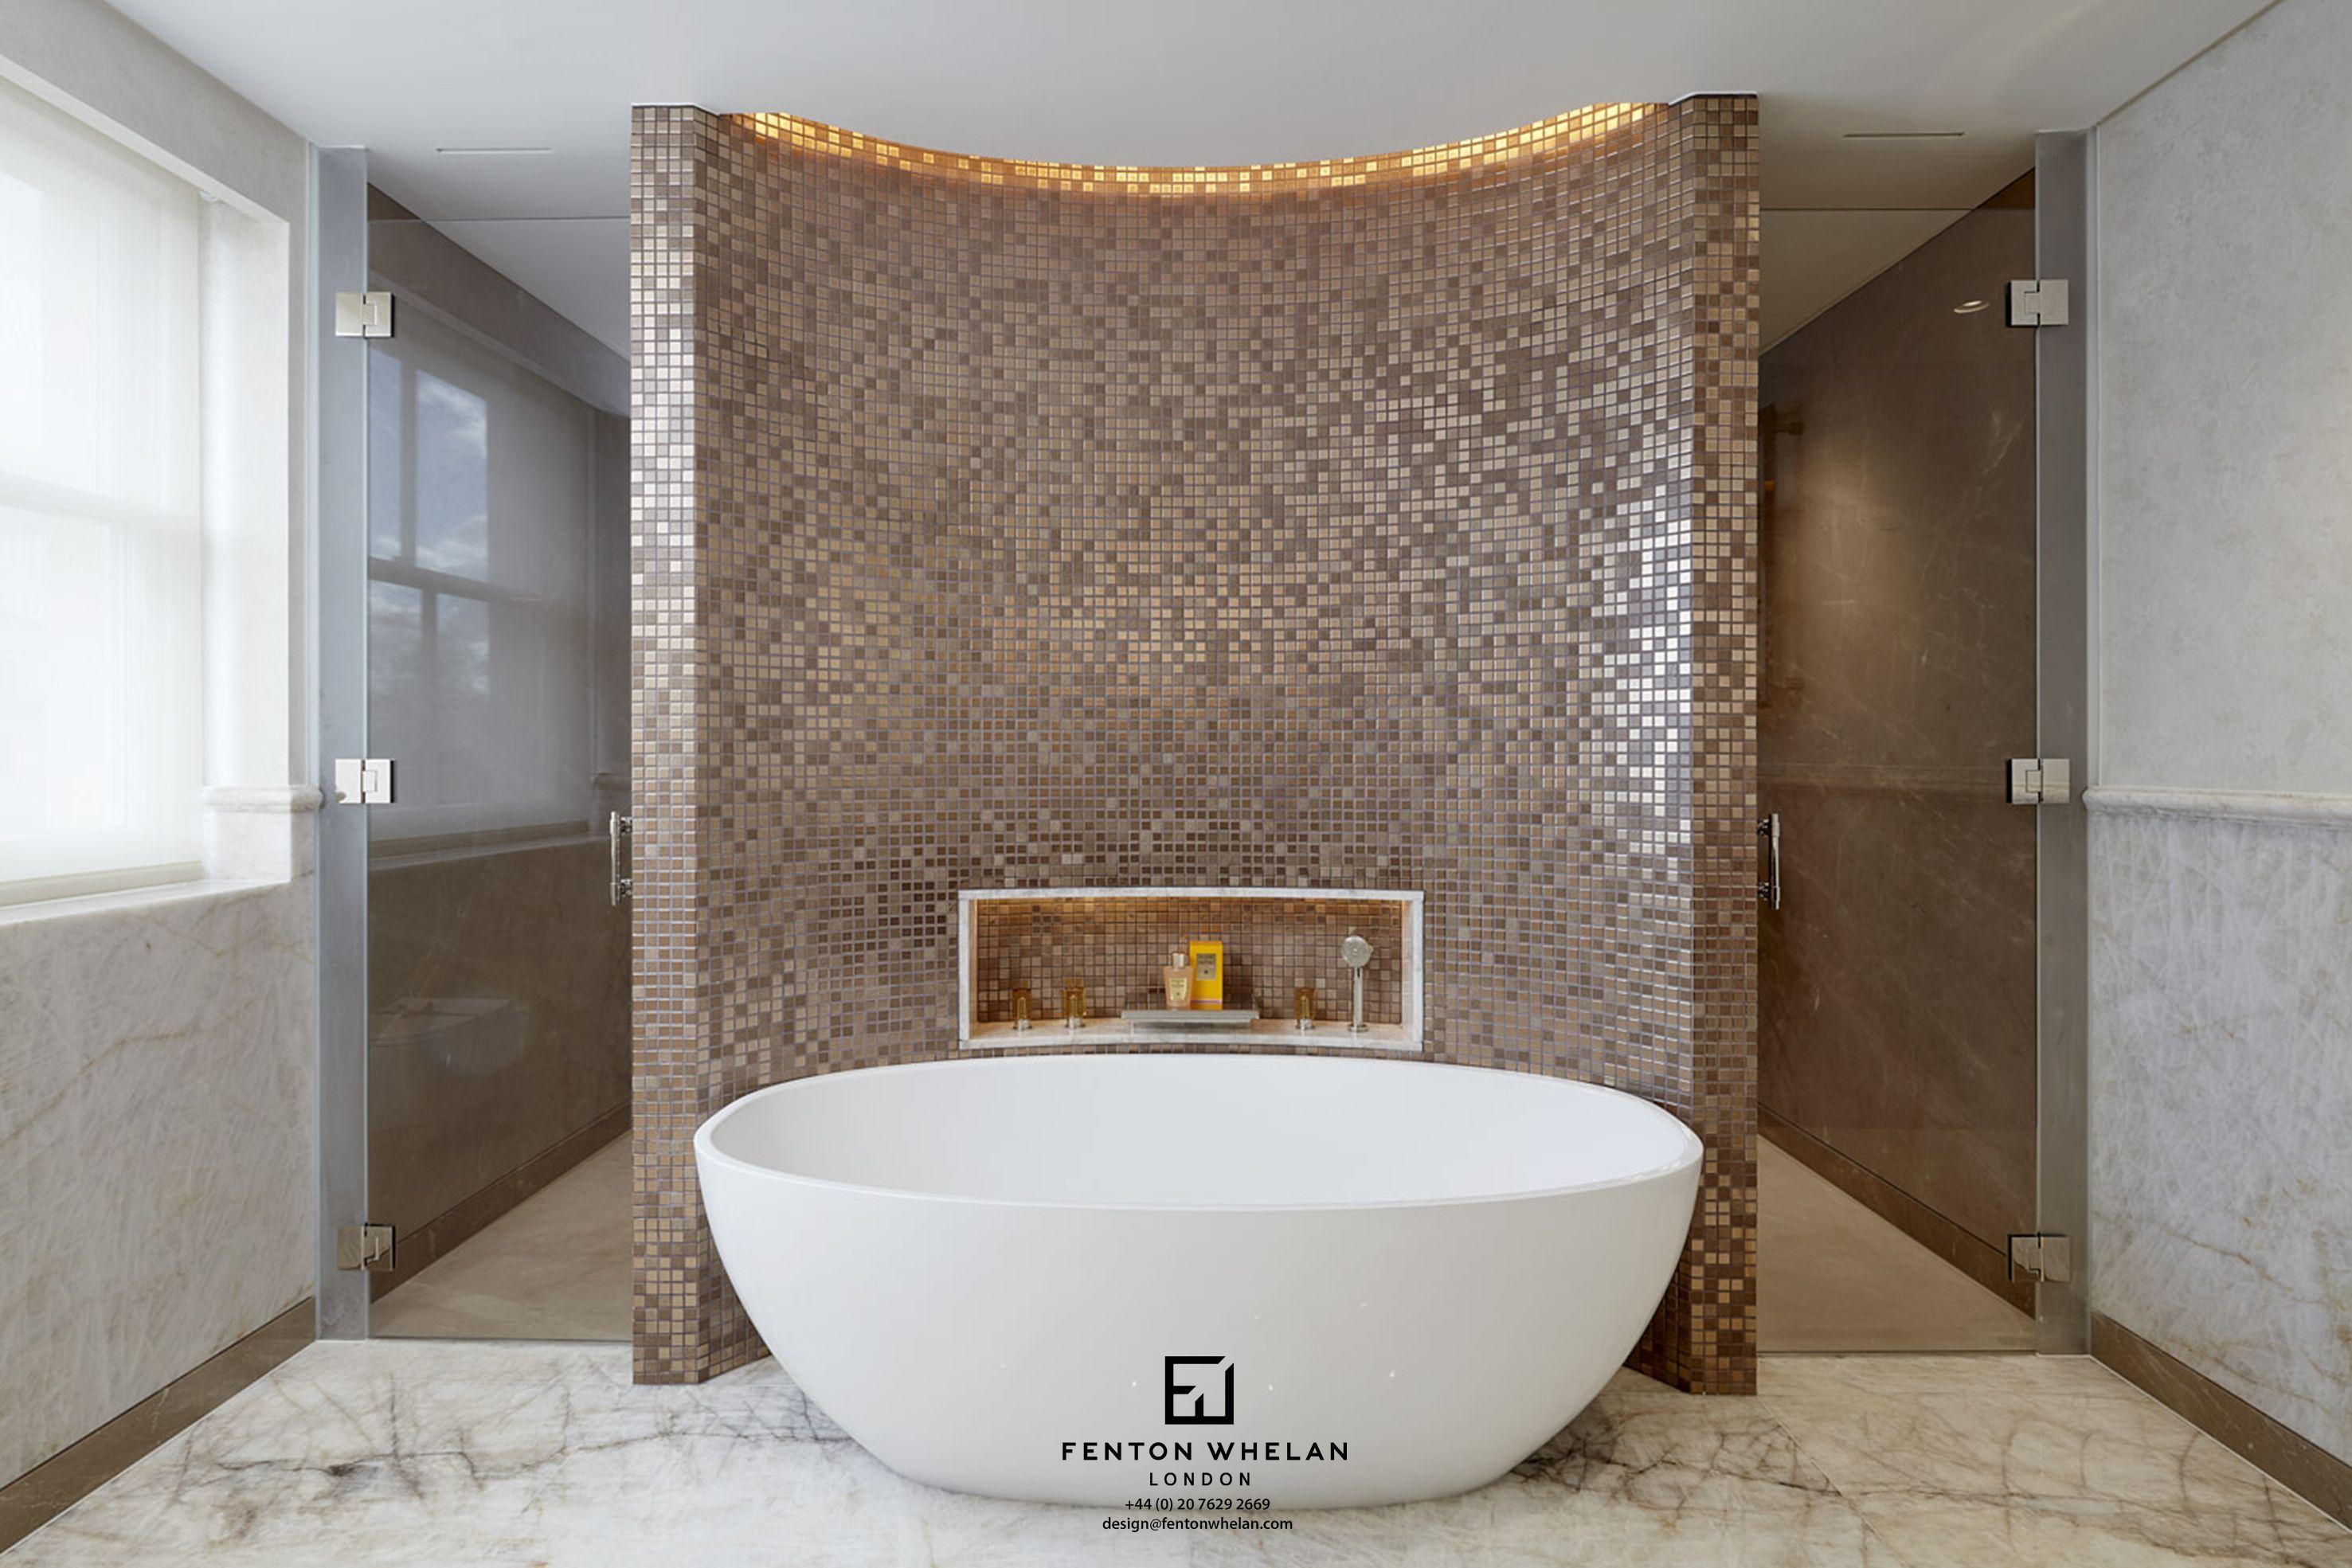 Einzel-schlafzimmer-wohndesign pin by elle elle on bathe in   pinterest  pent house bedroom